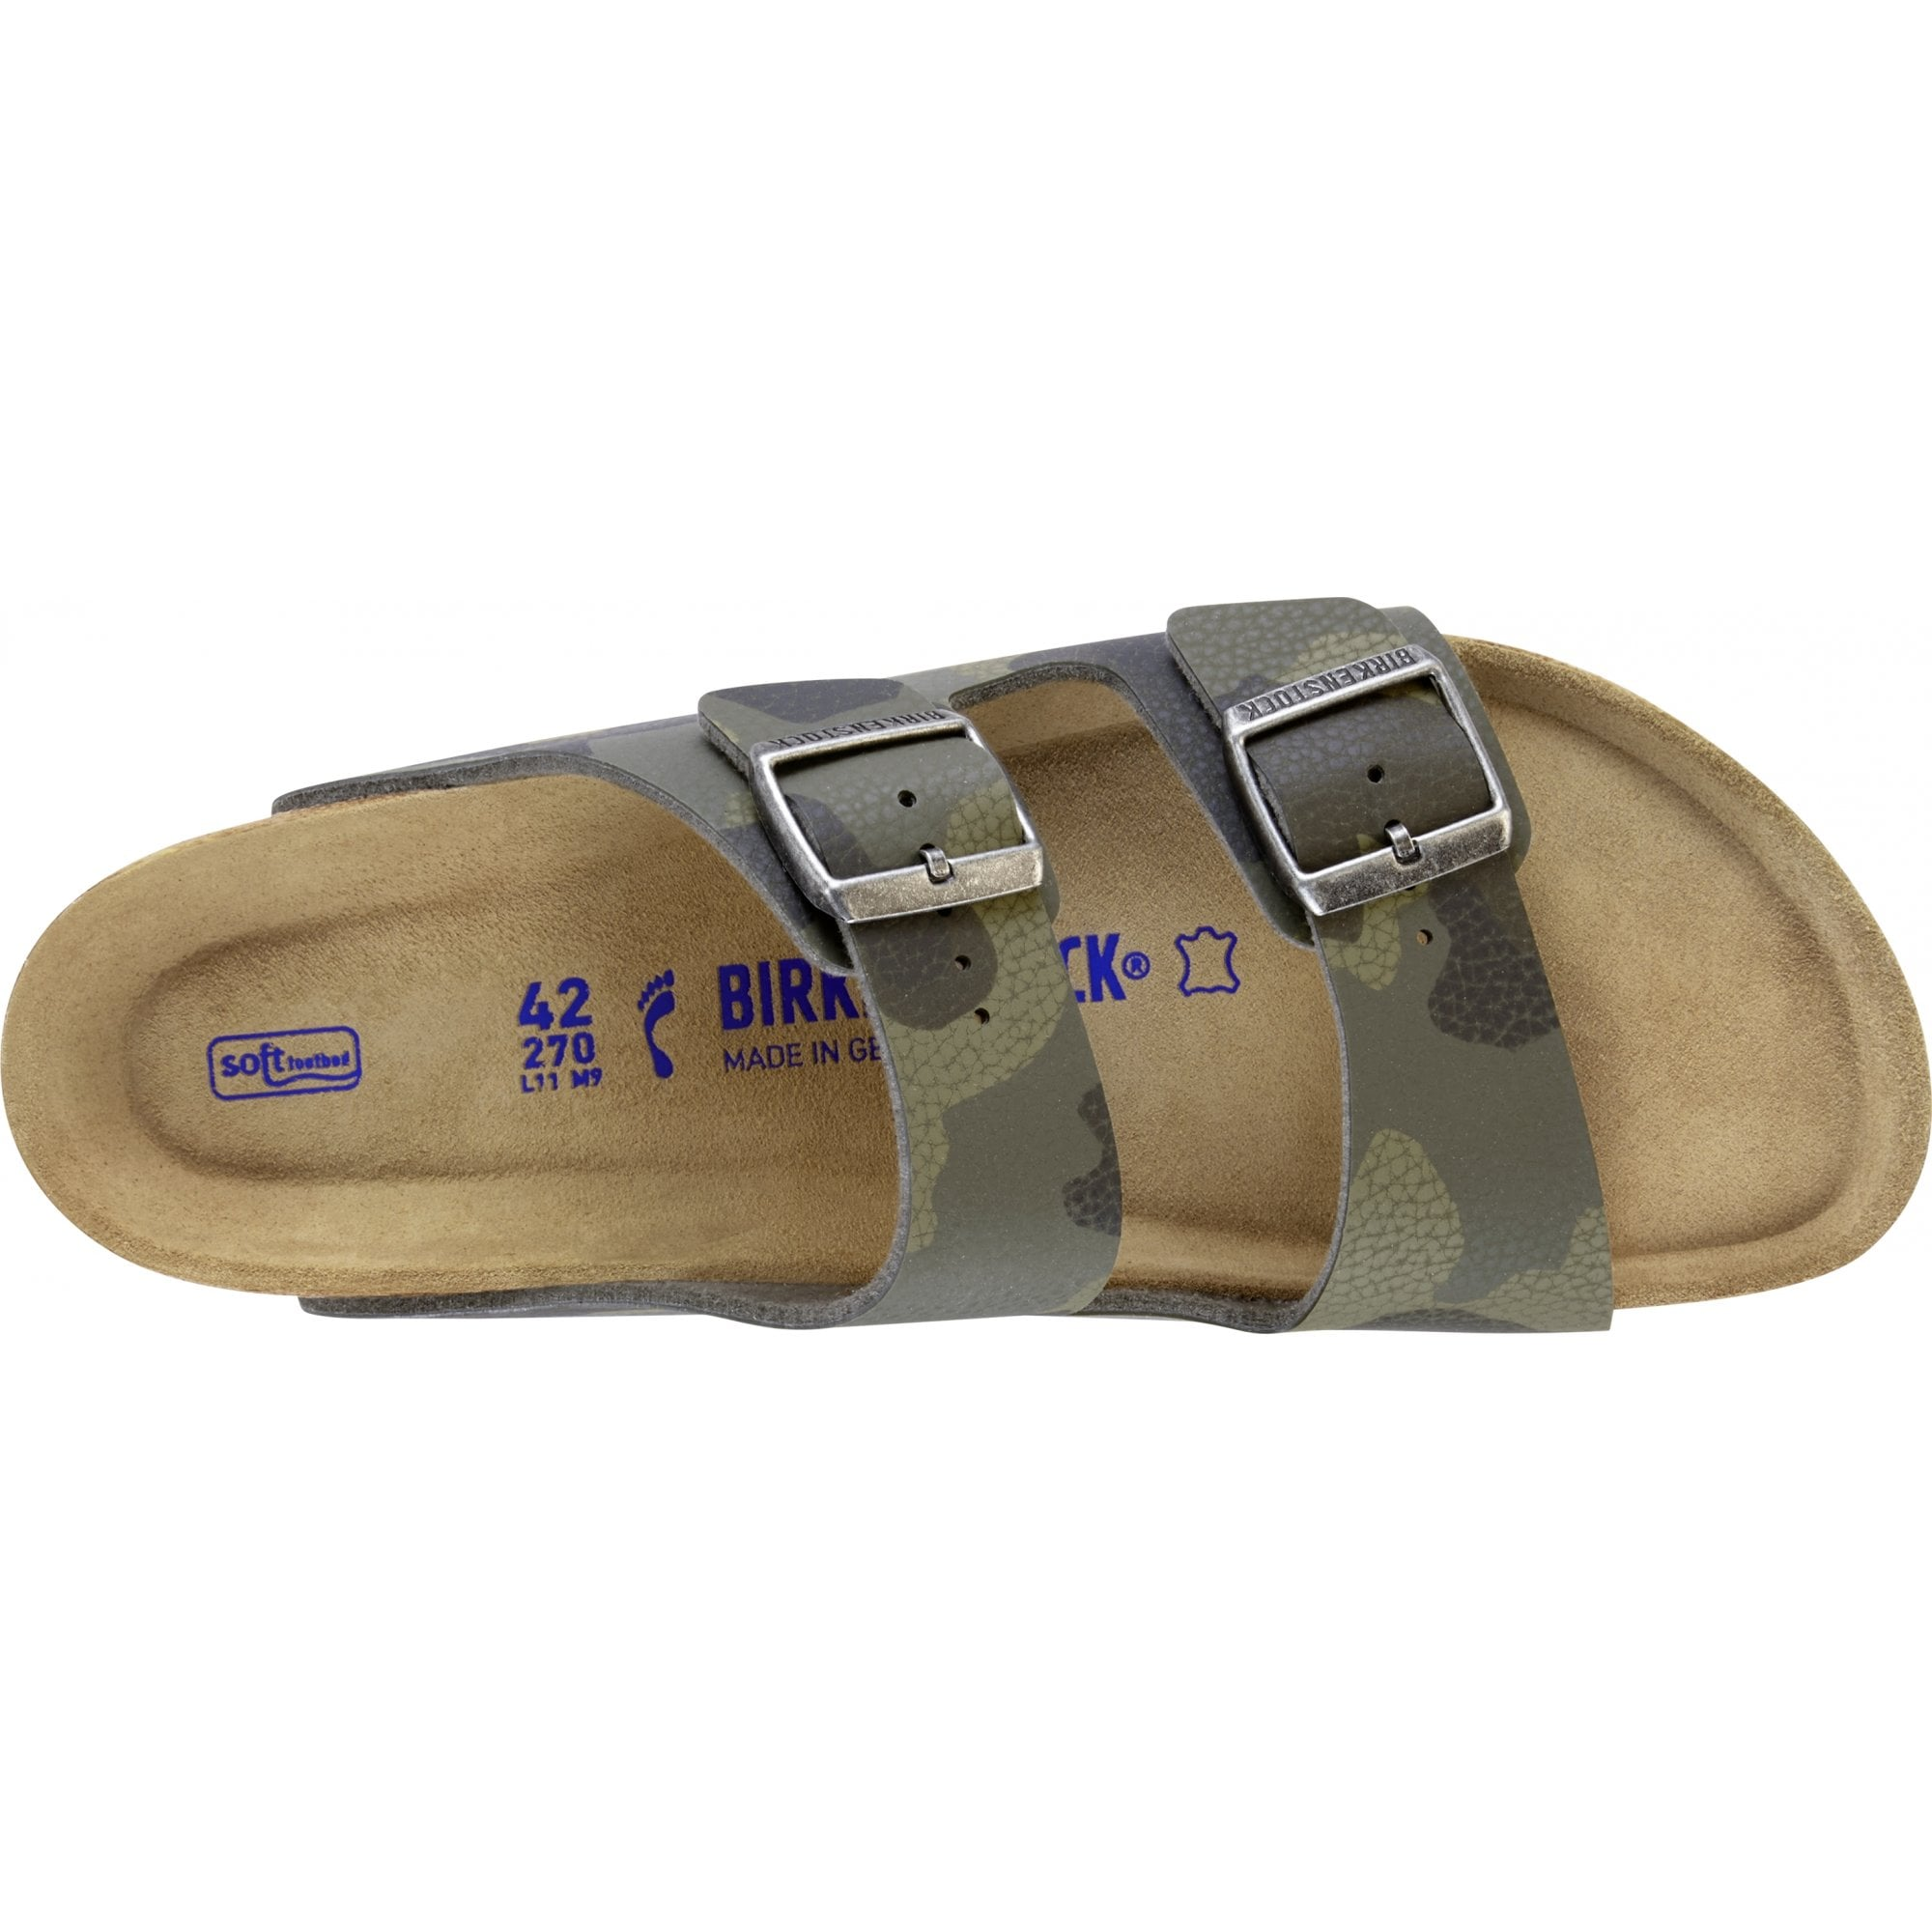 77a6cbd84303 Birkenstock Arizona Soft Footbed Sandals In Camouflage Green ...